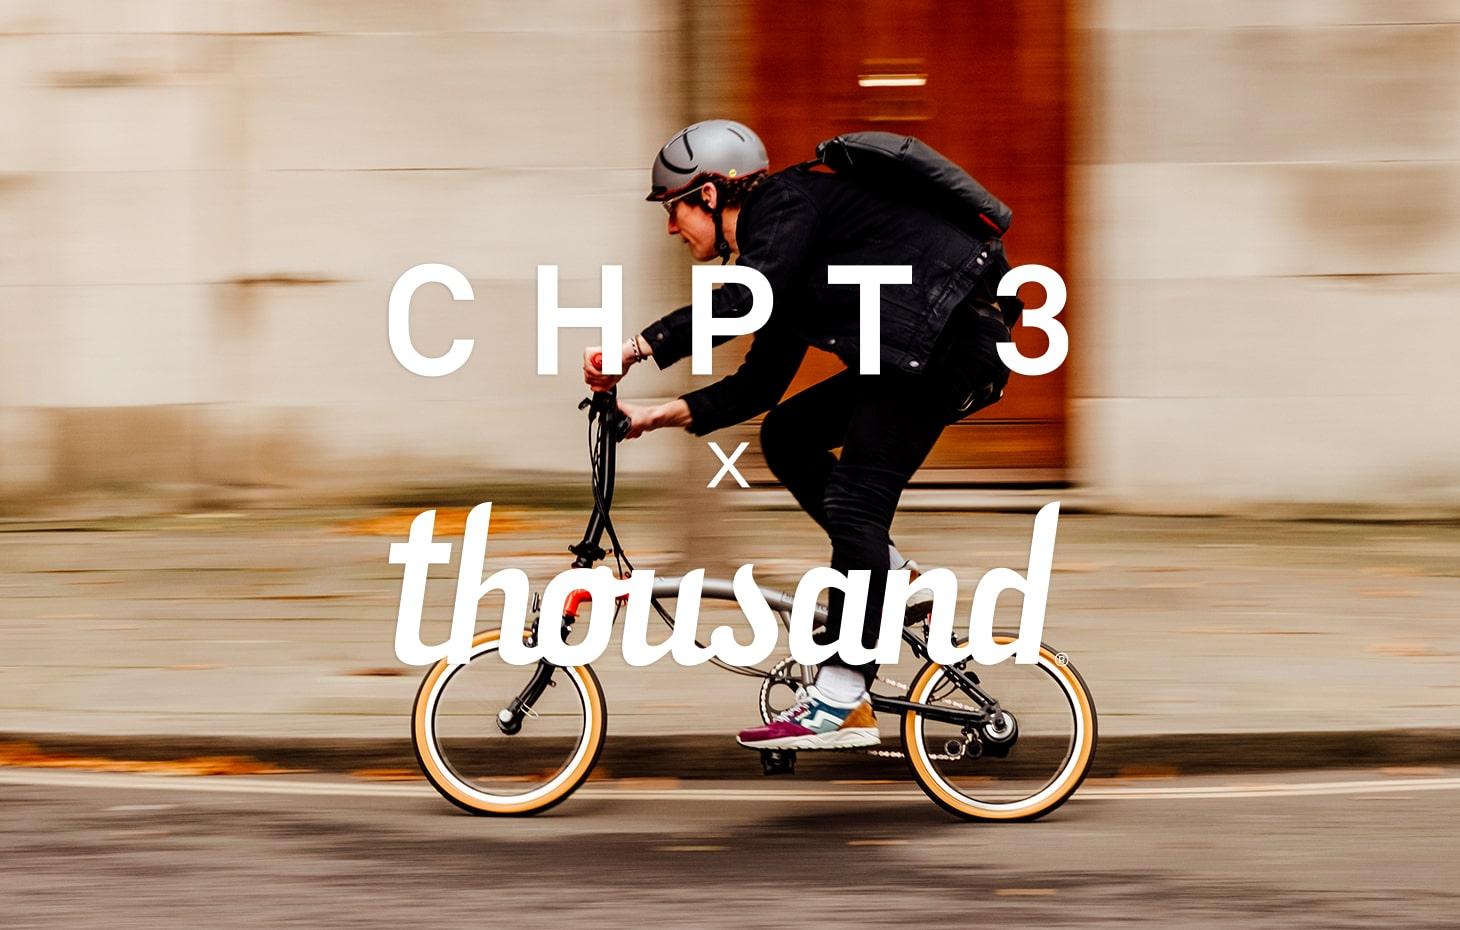 CHPT3 x Thousand